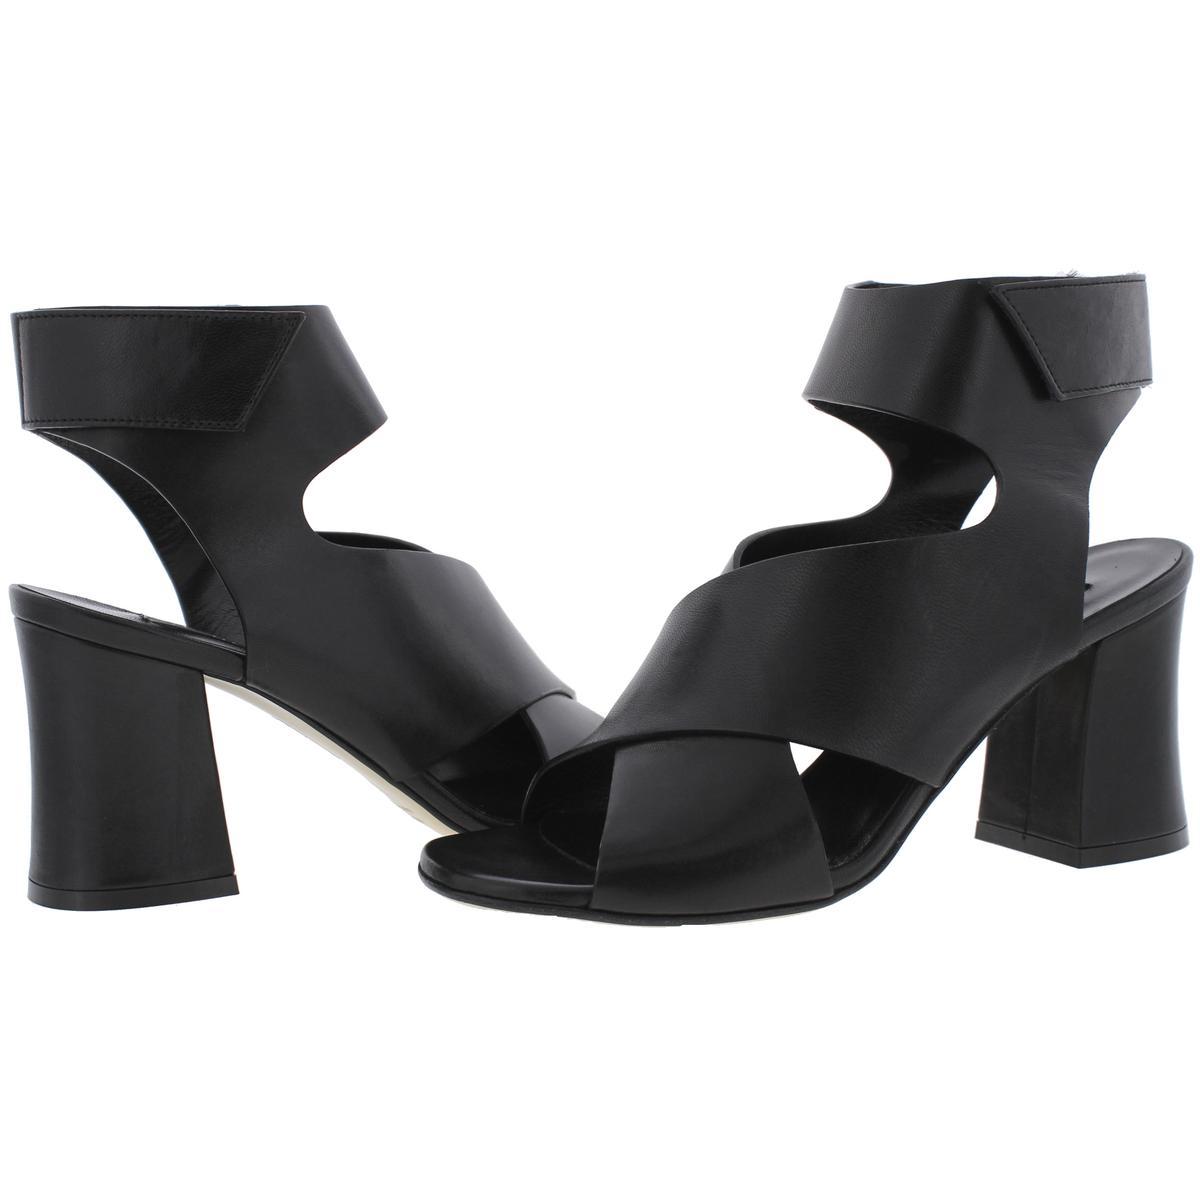 Steven-By-Steve-Madden-Womens-Kitzy-Crisscross-Dress-Sandals-Shoes-BHFO-5760 thumbnail 8